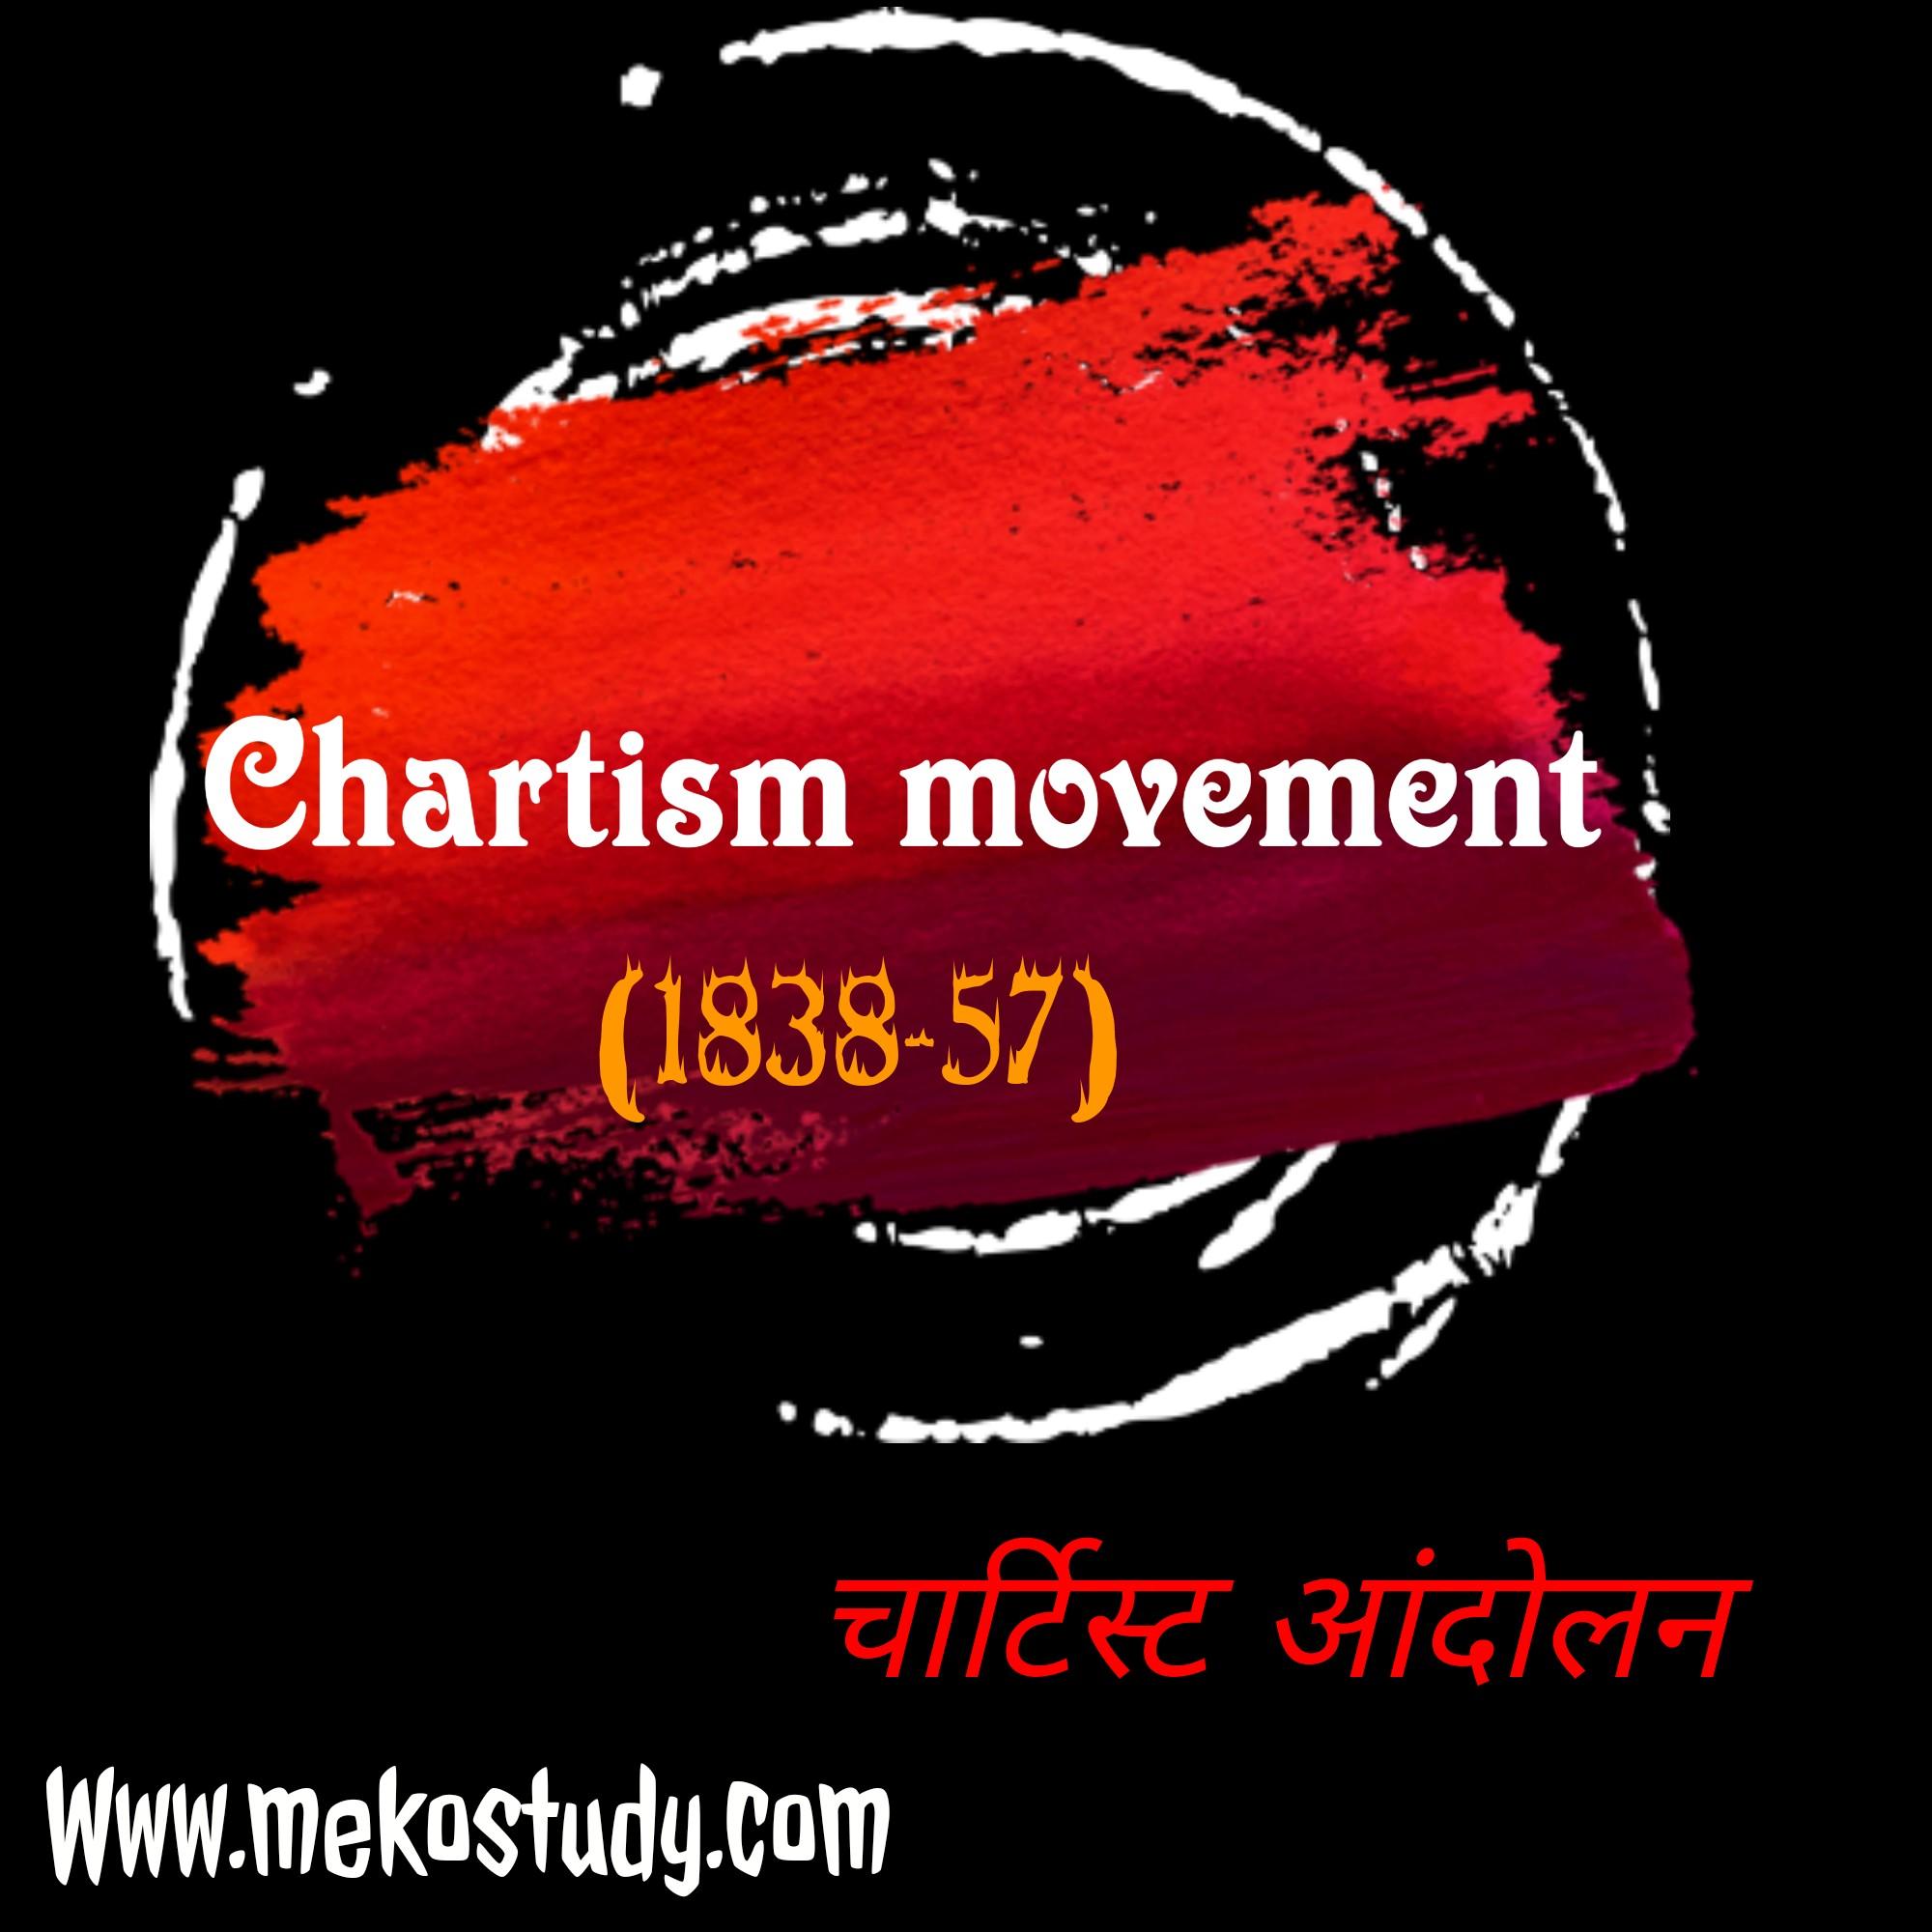 Chartism Movement